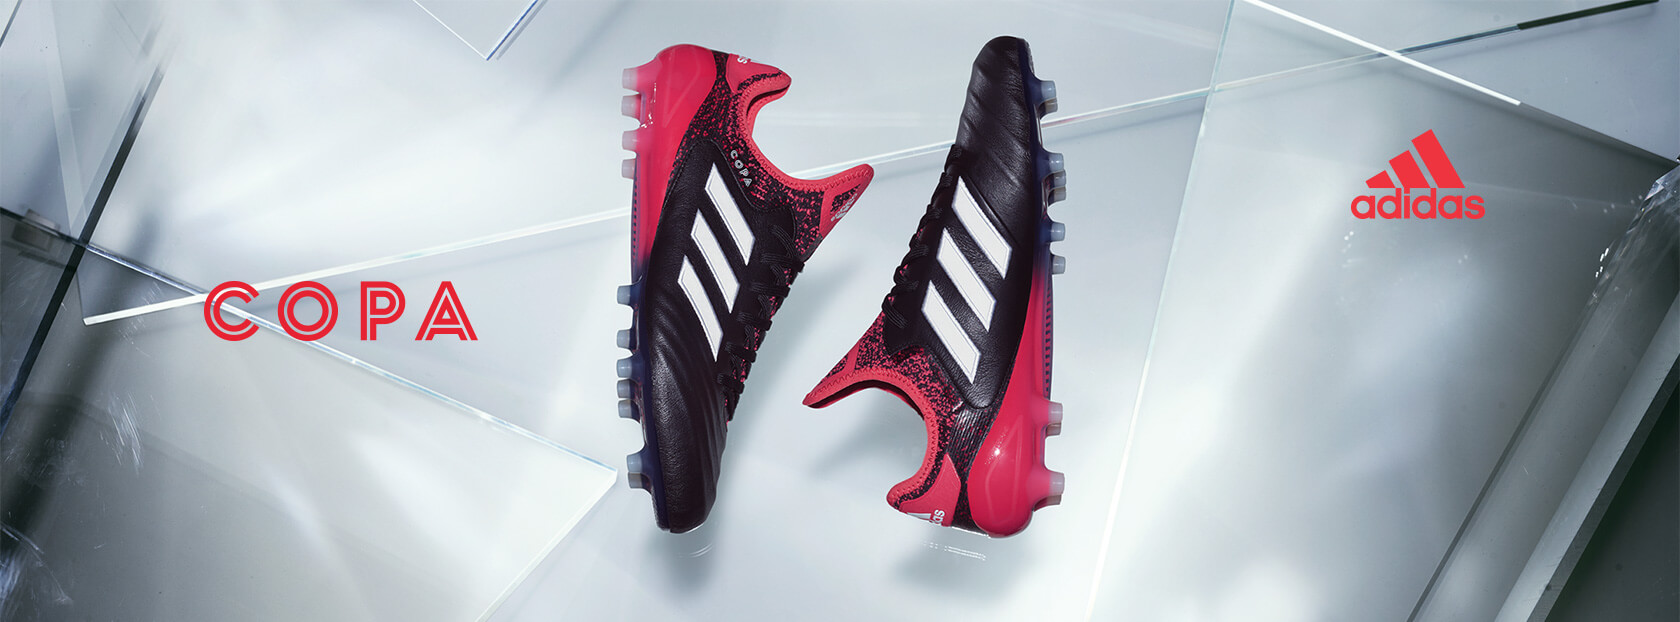 newest 329b3 1abae Kjøp adidas Copa 18.1 Cold Blooded fotballsko på unisportsto